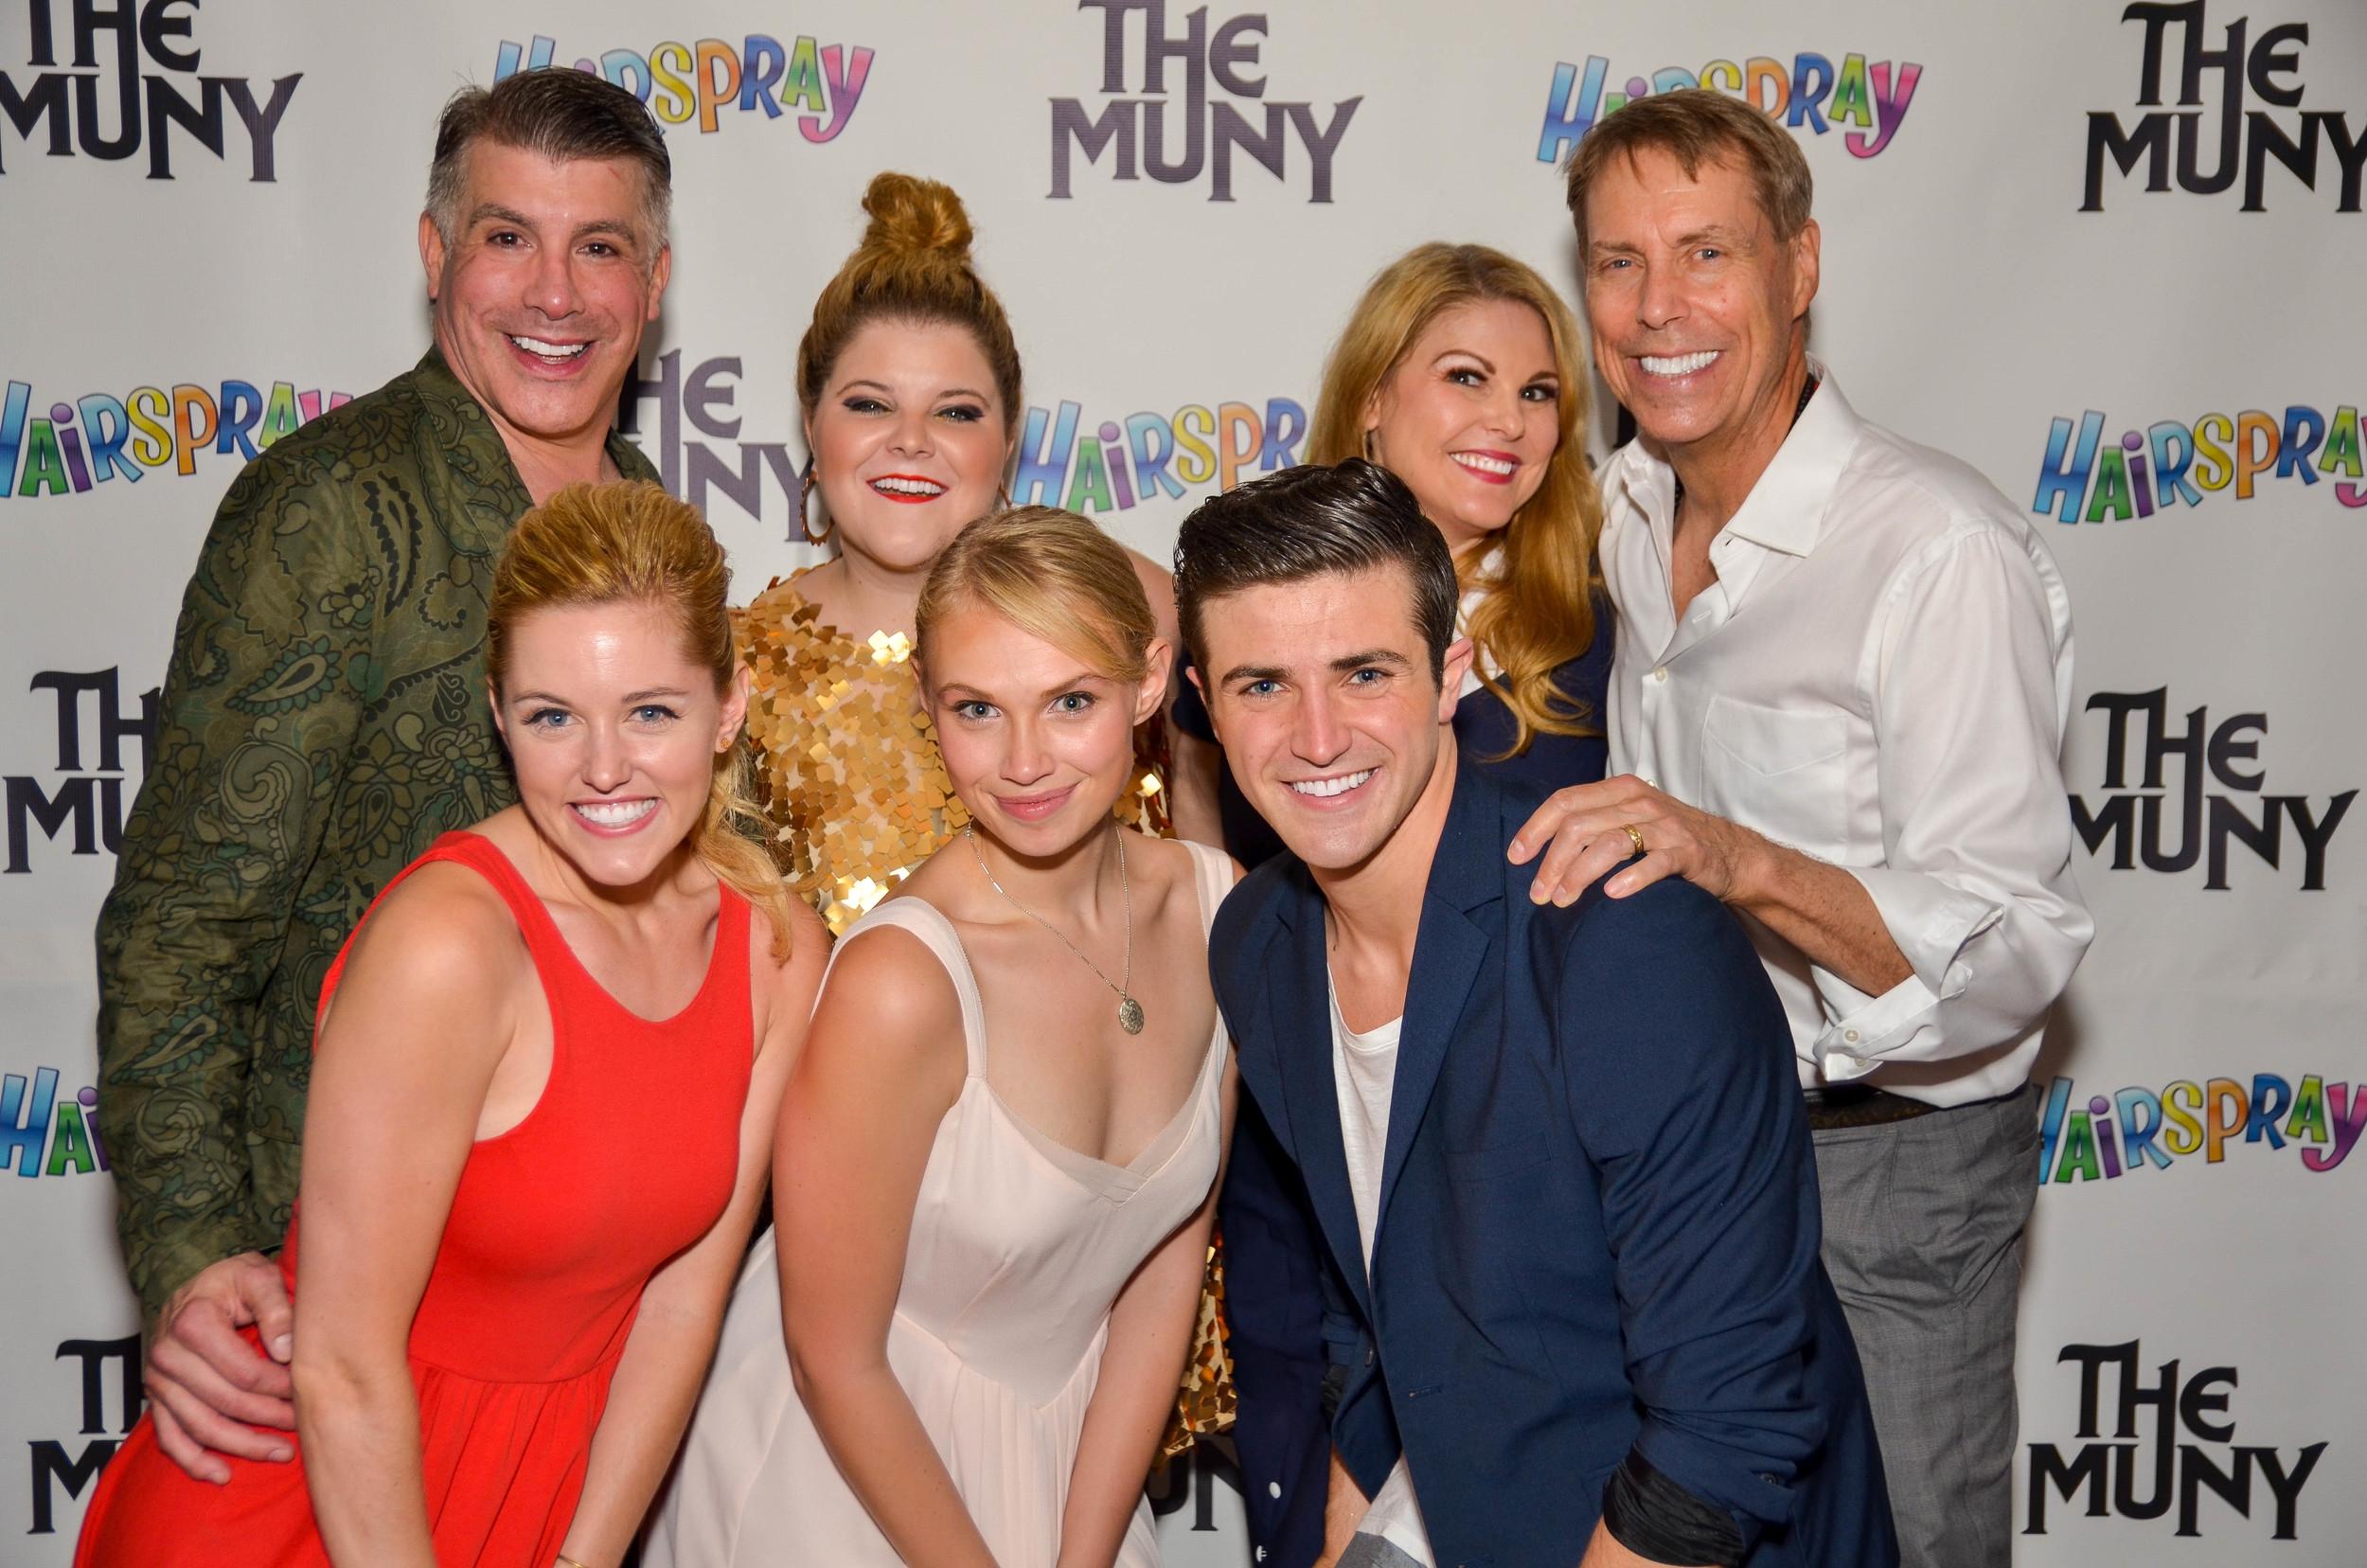 Opening Night of Hairspray @ The Muny